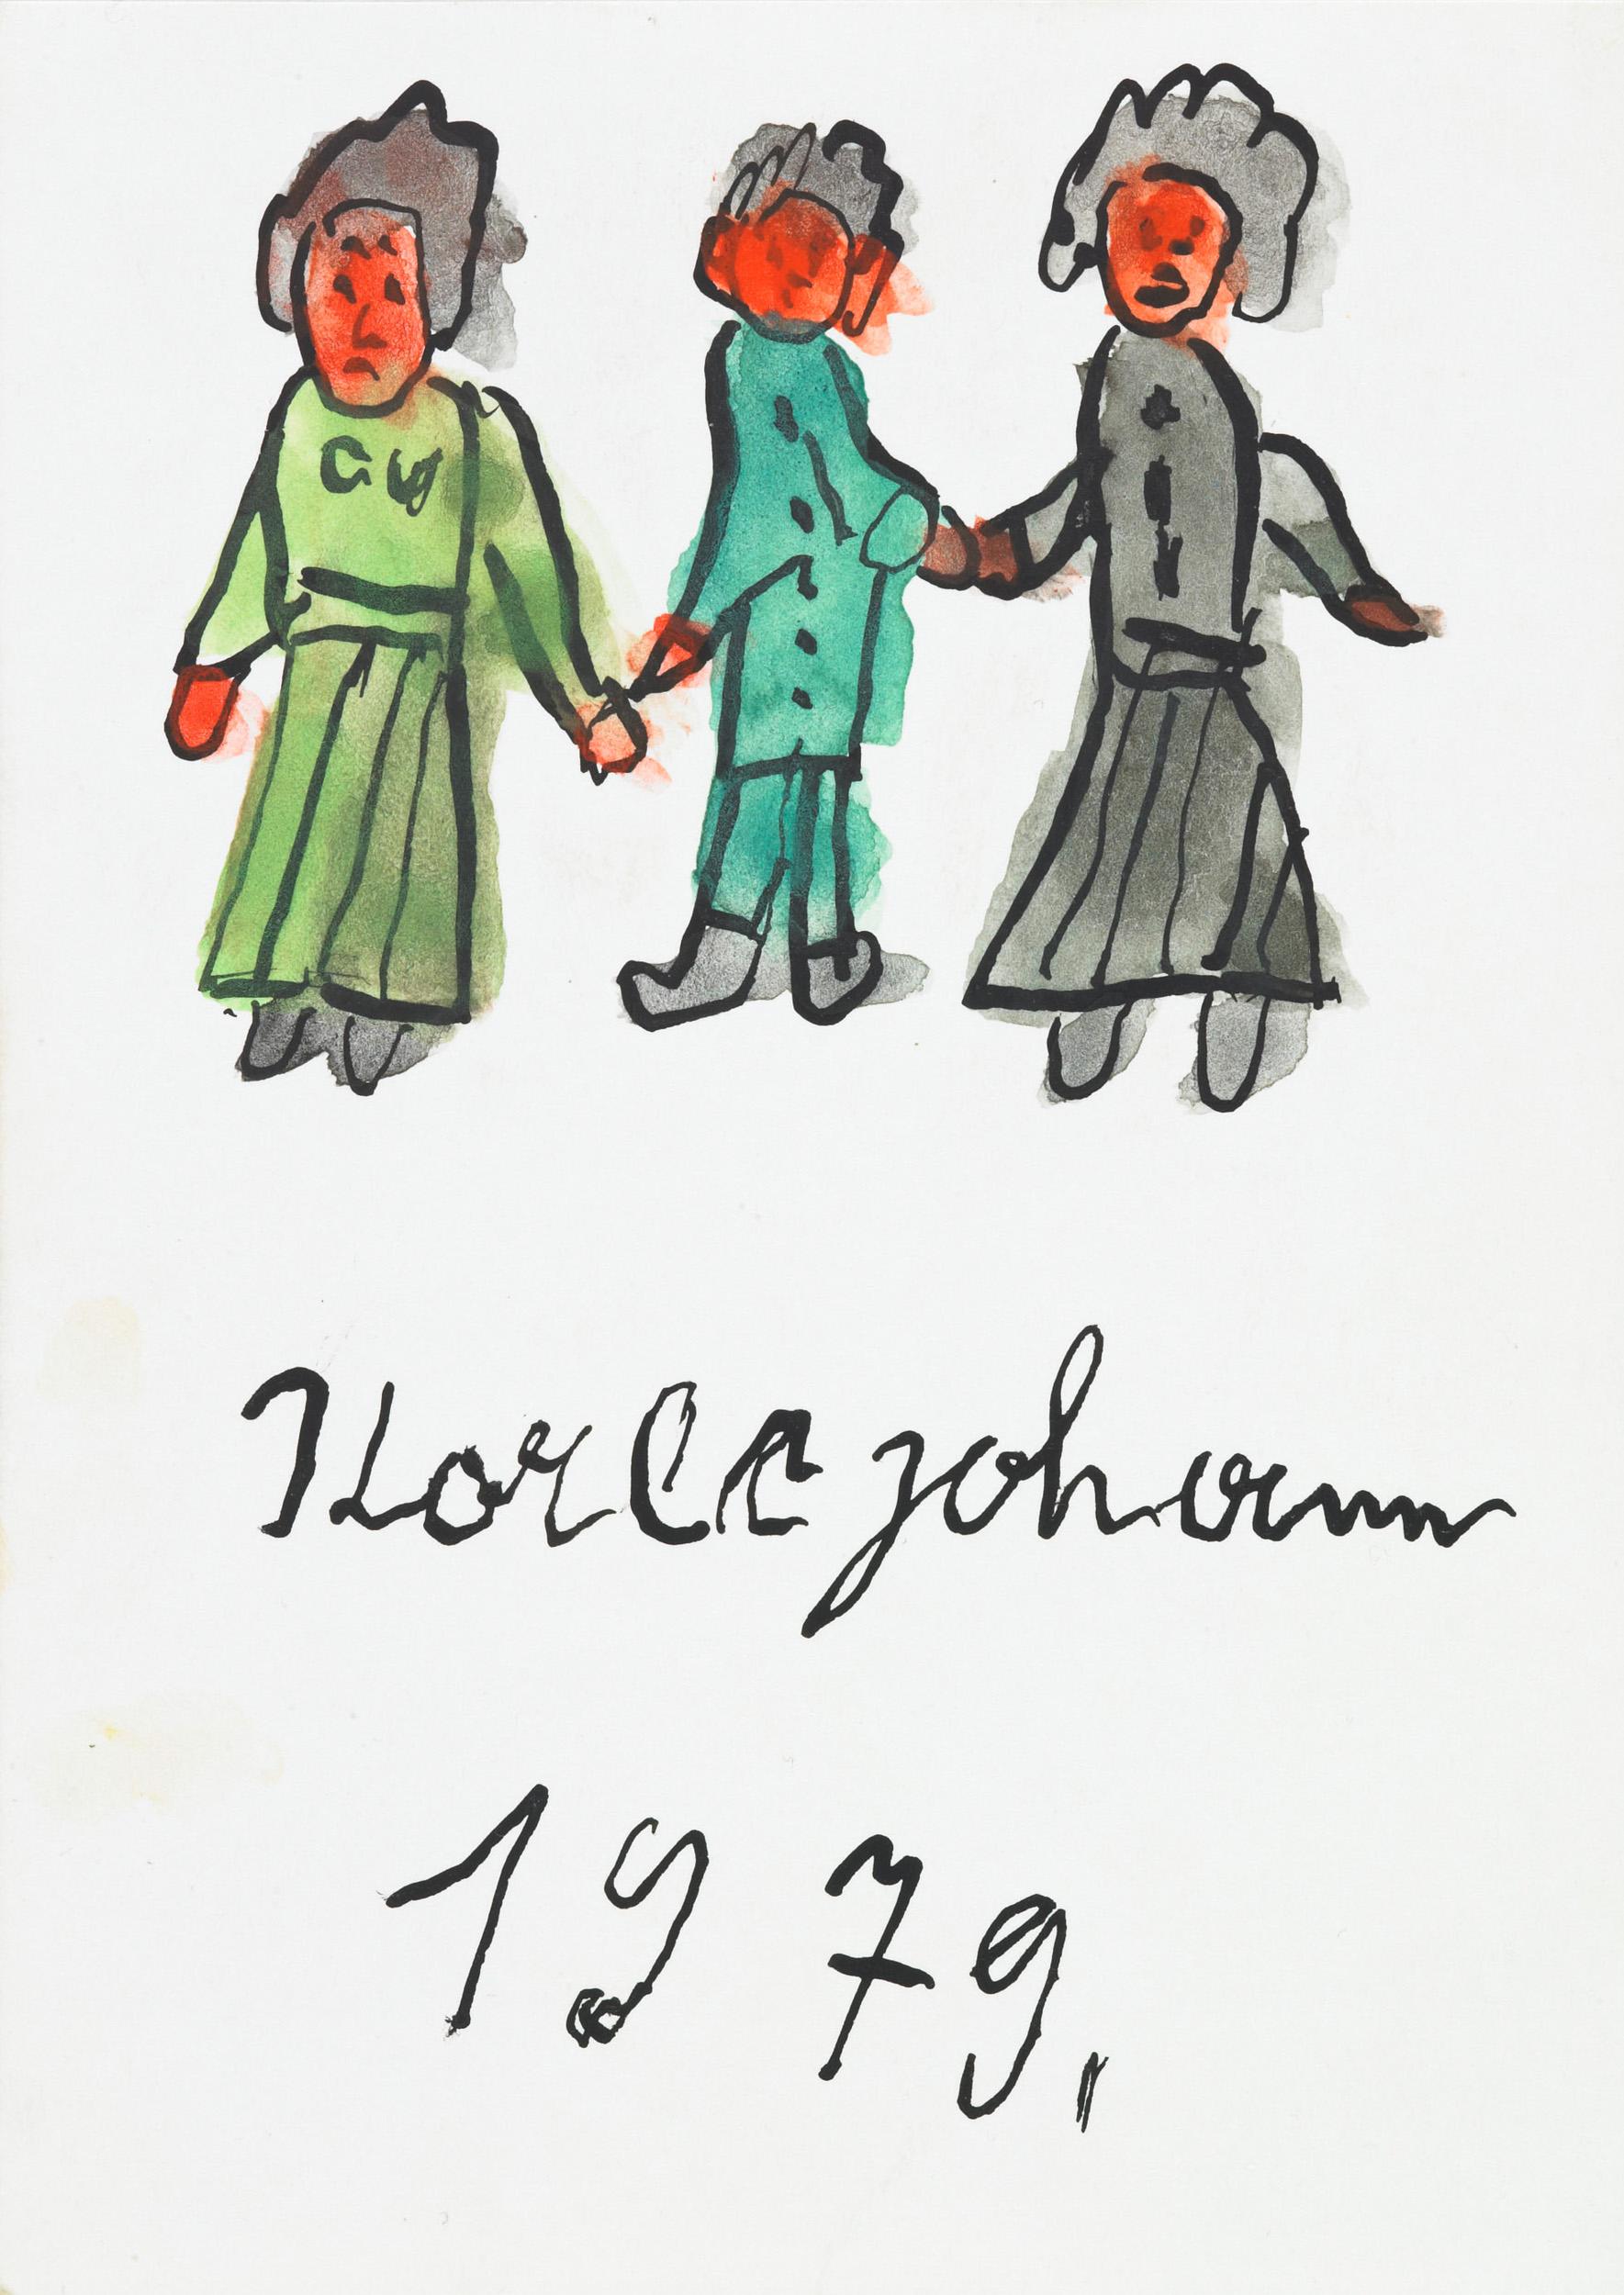 korec johann - Ohne Titel / Untitled